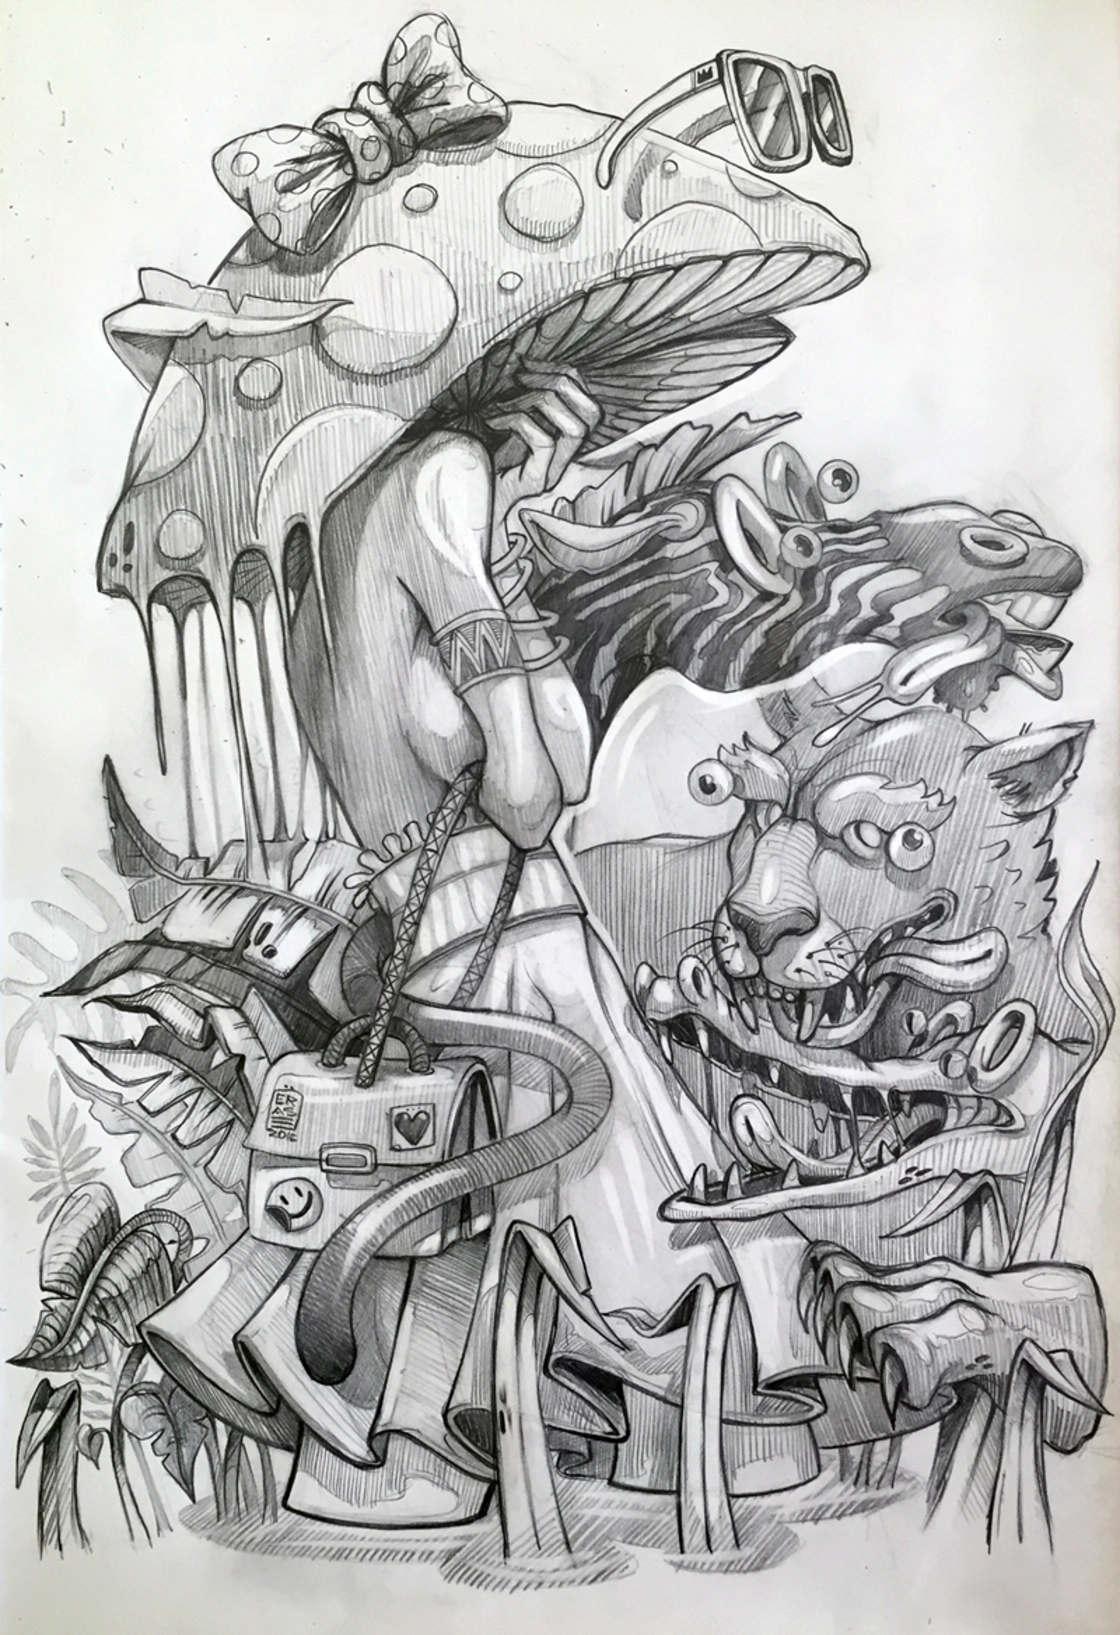 Les nouvelles illustrations d'ERASE (19 pics)